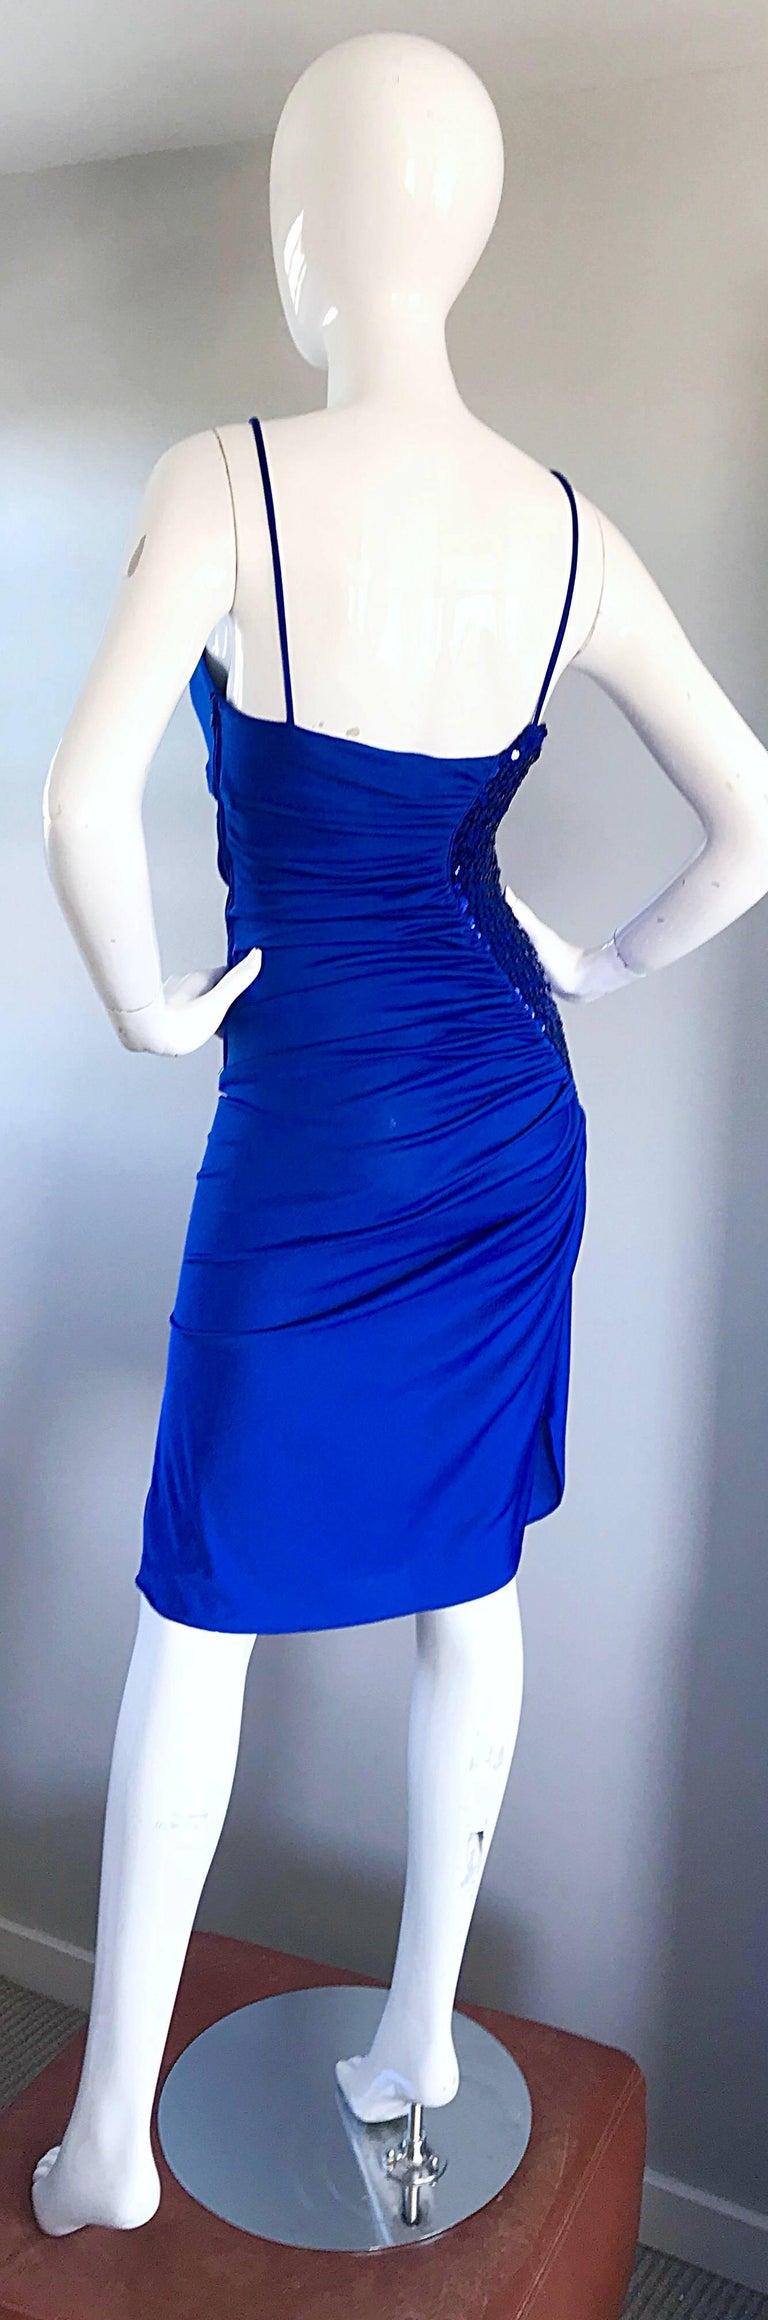 1980s Samir Royal Blue Jersey + Sequins Sexy Slinky Vintage 80s Disco Dress For Sale 6